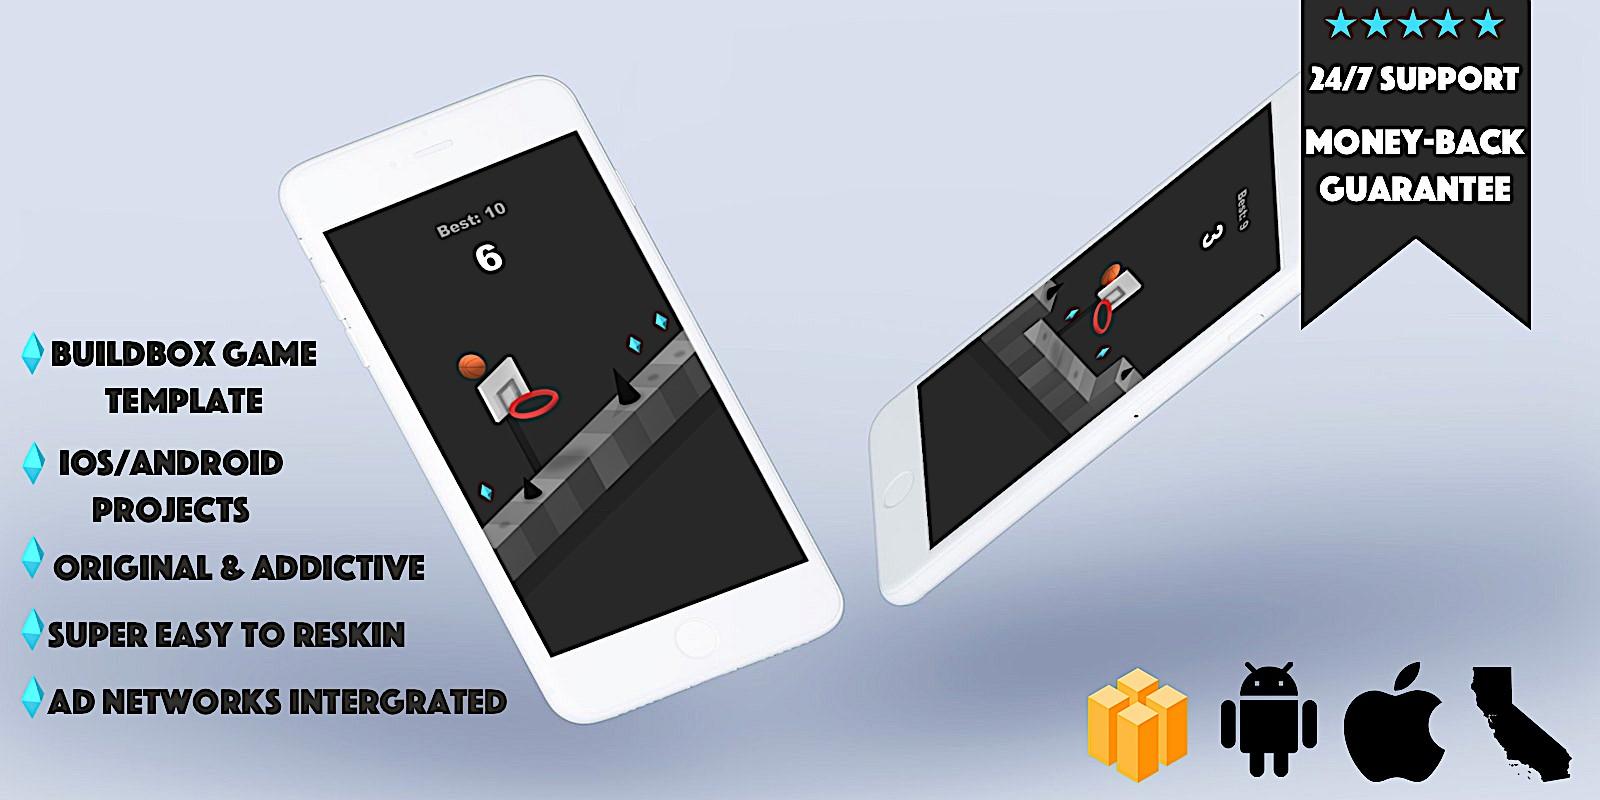 Jump Shot - Buildbox Template